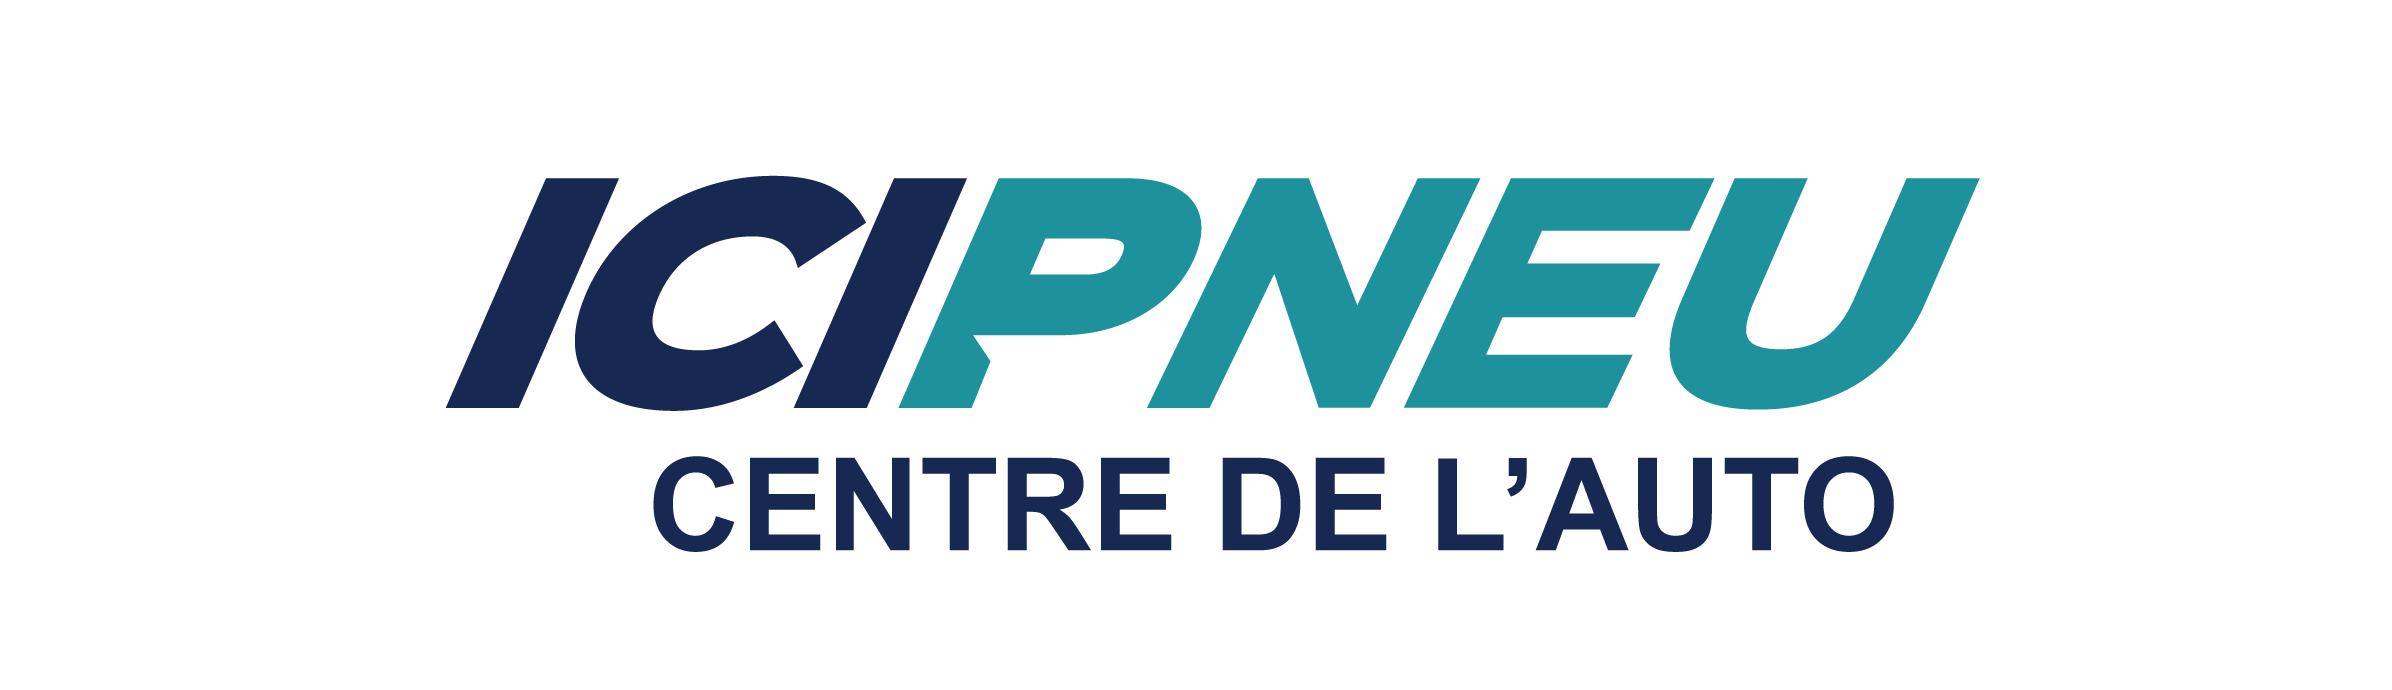 Bannière ICI Pneu